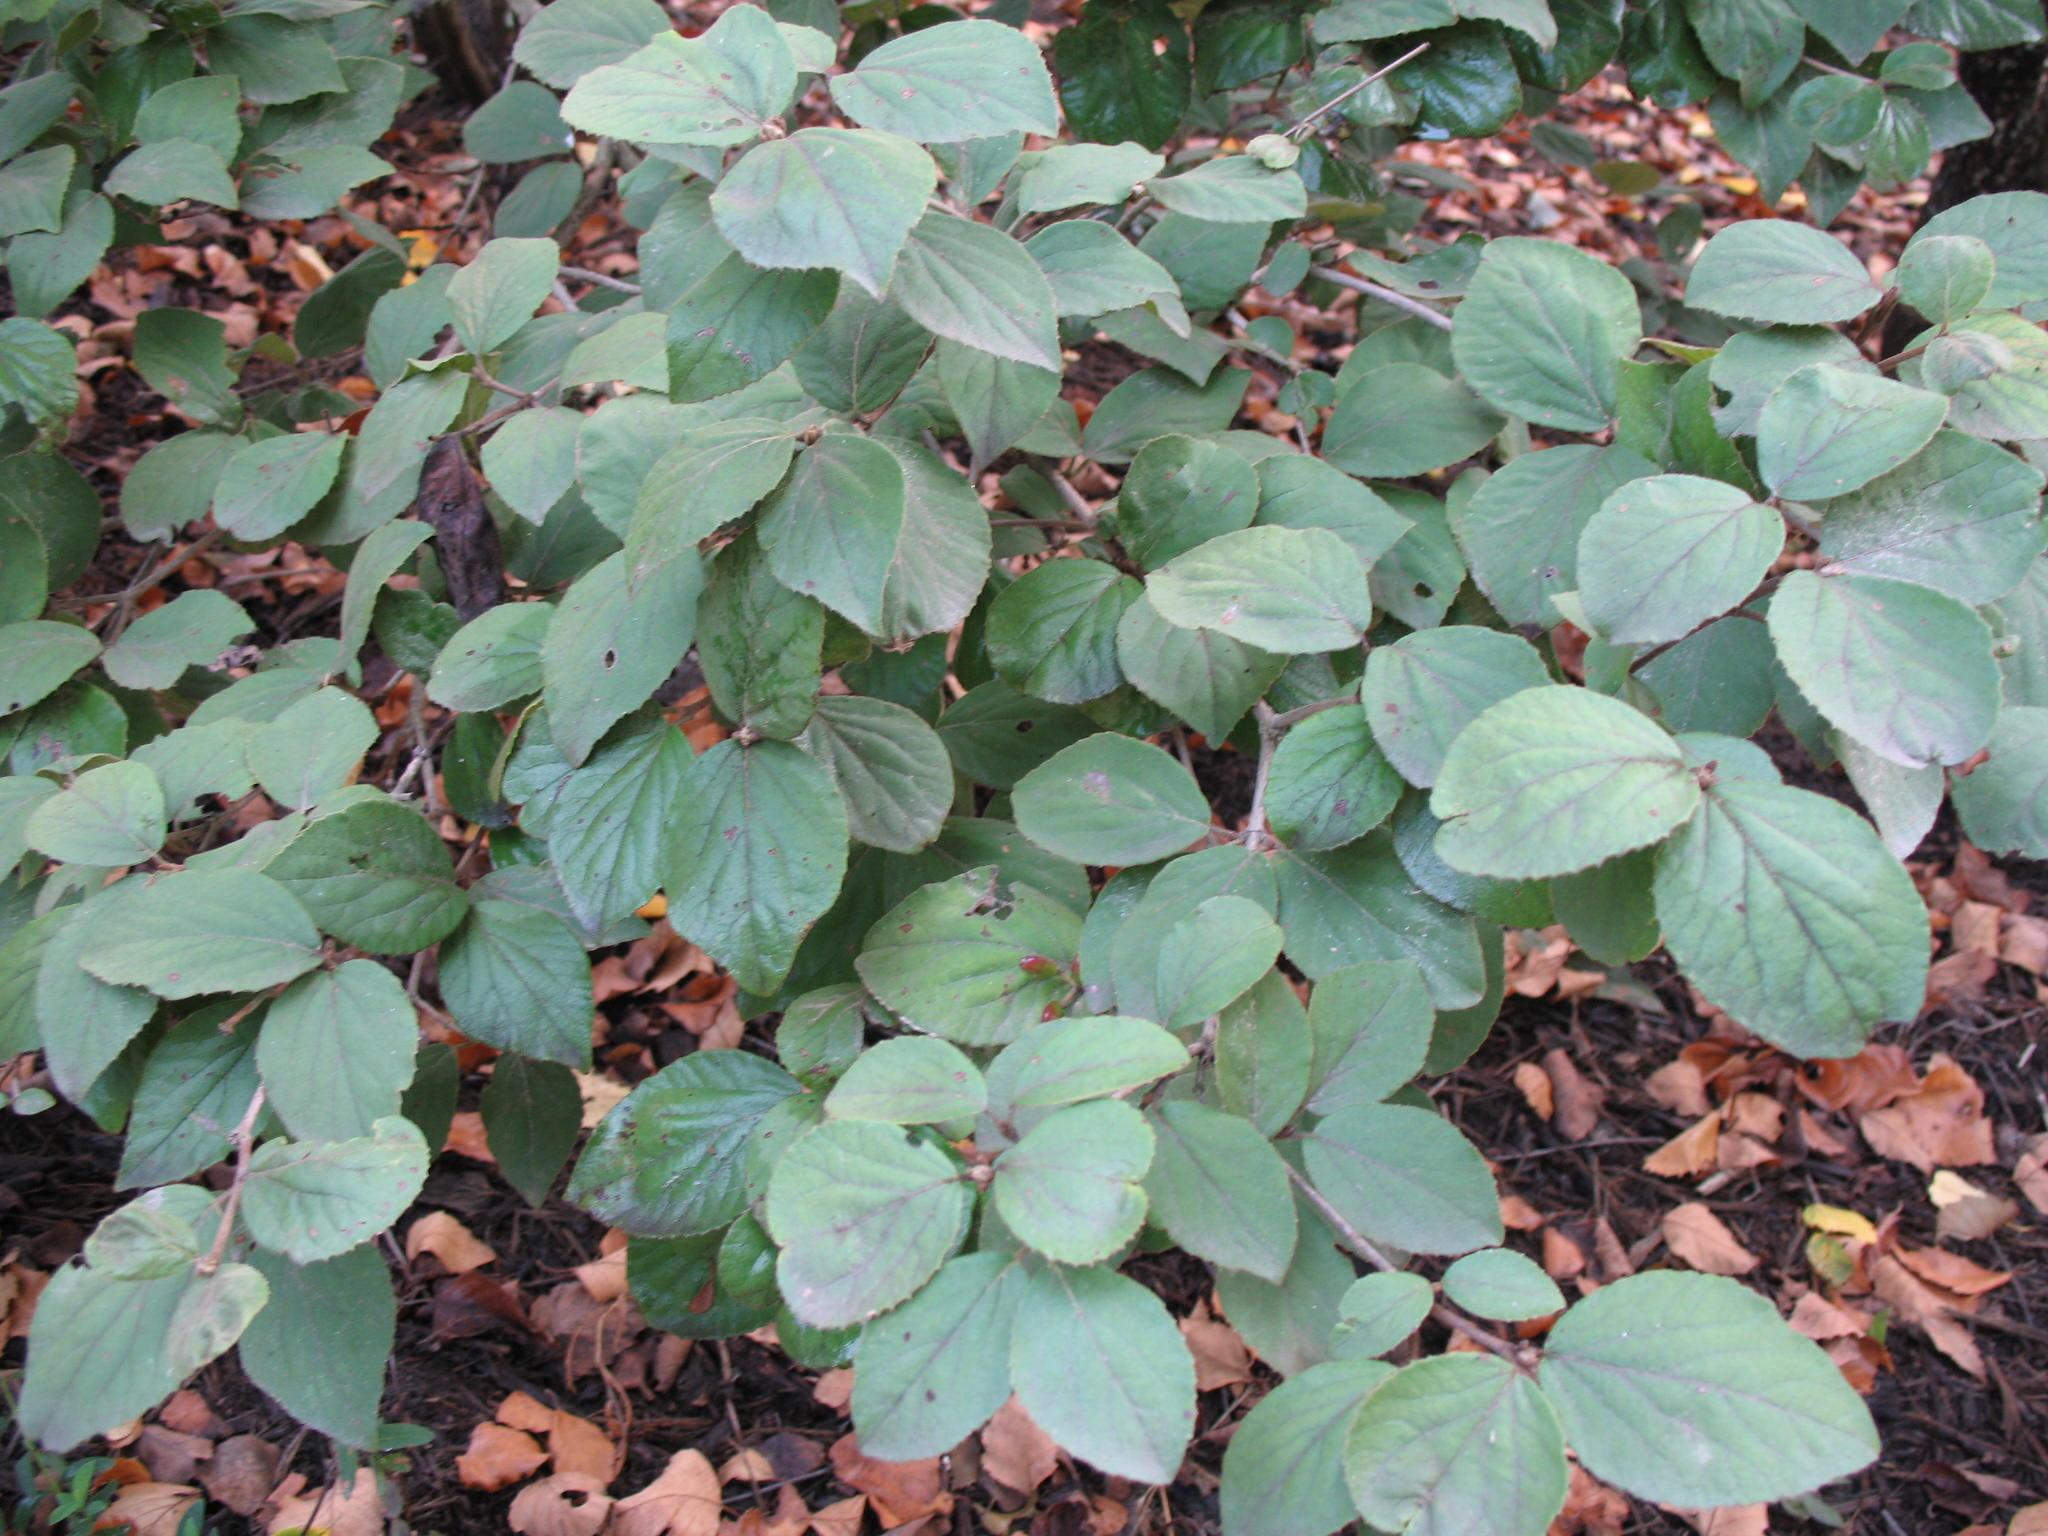 Viburnum carlesii / Viburnum carlesii